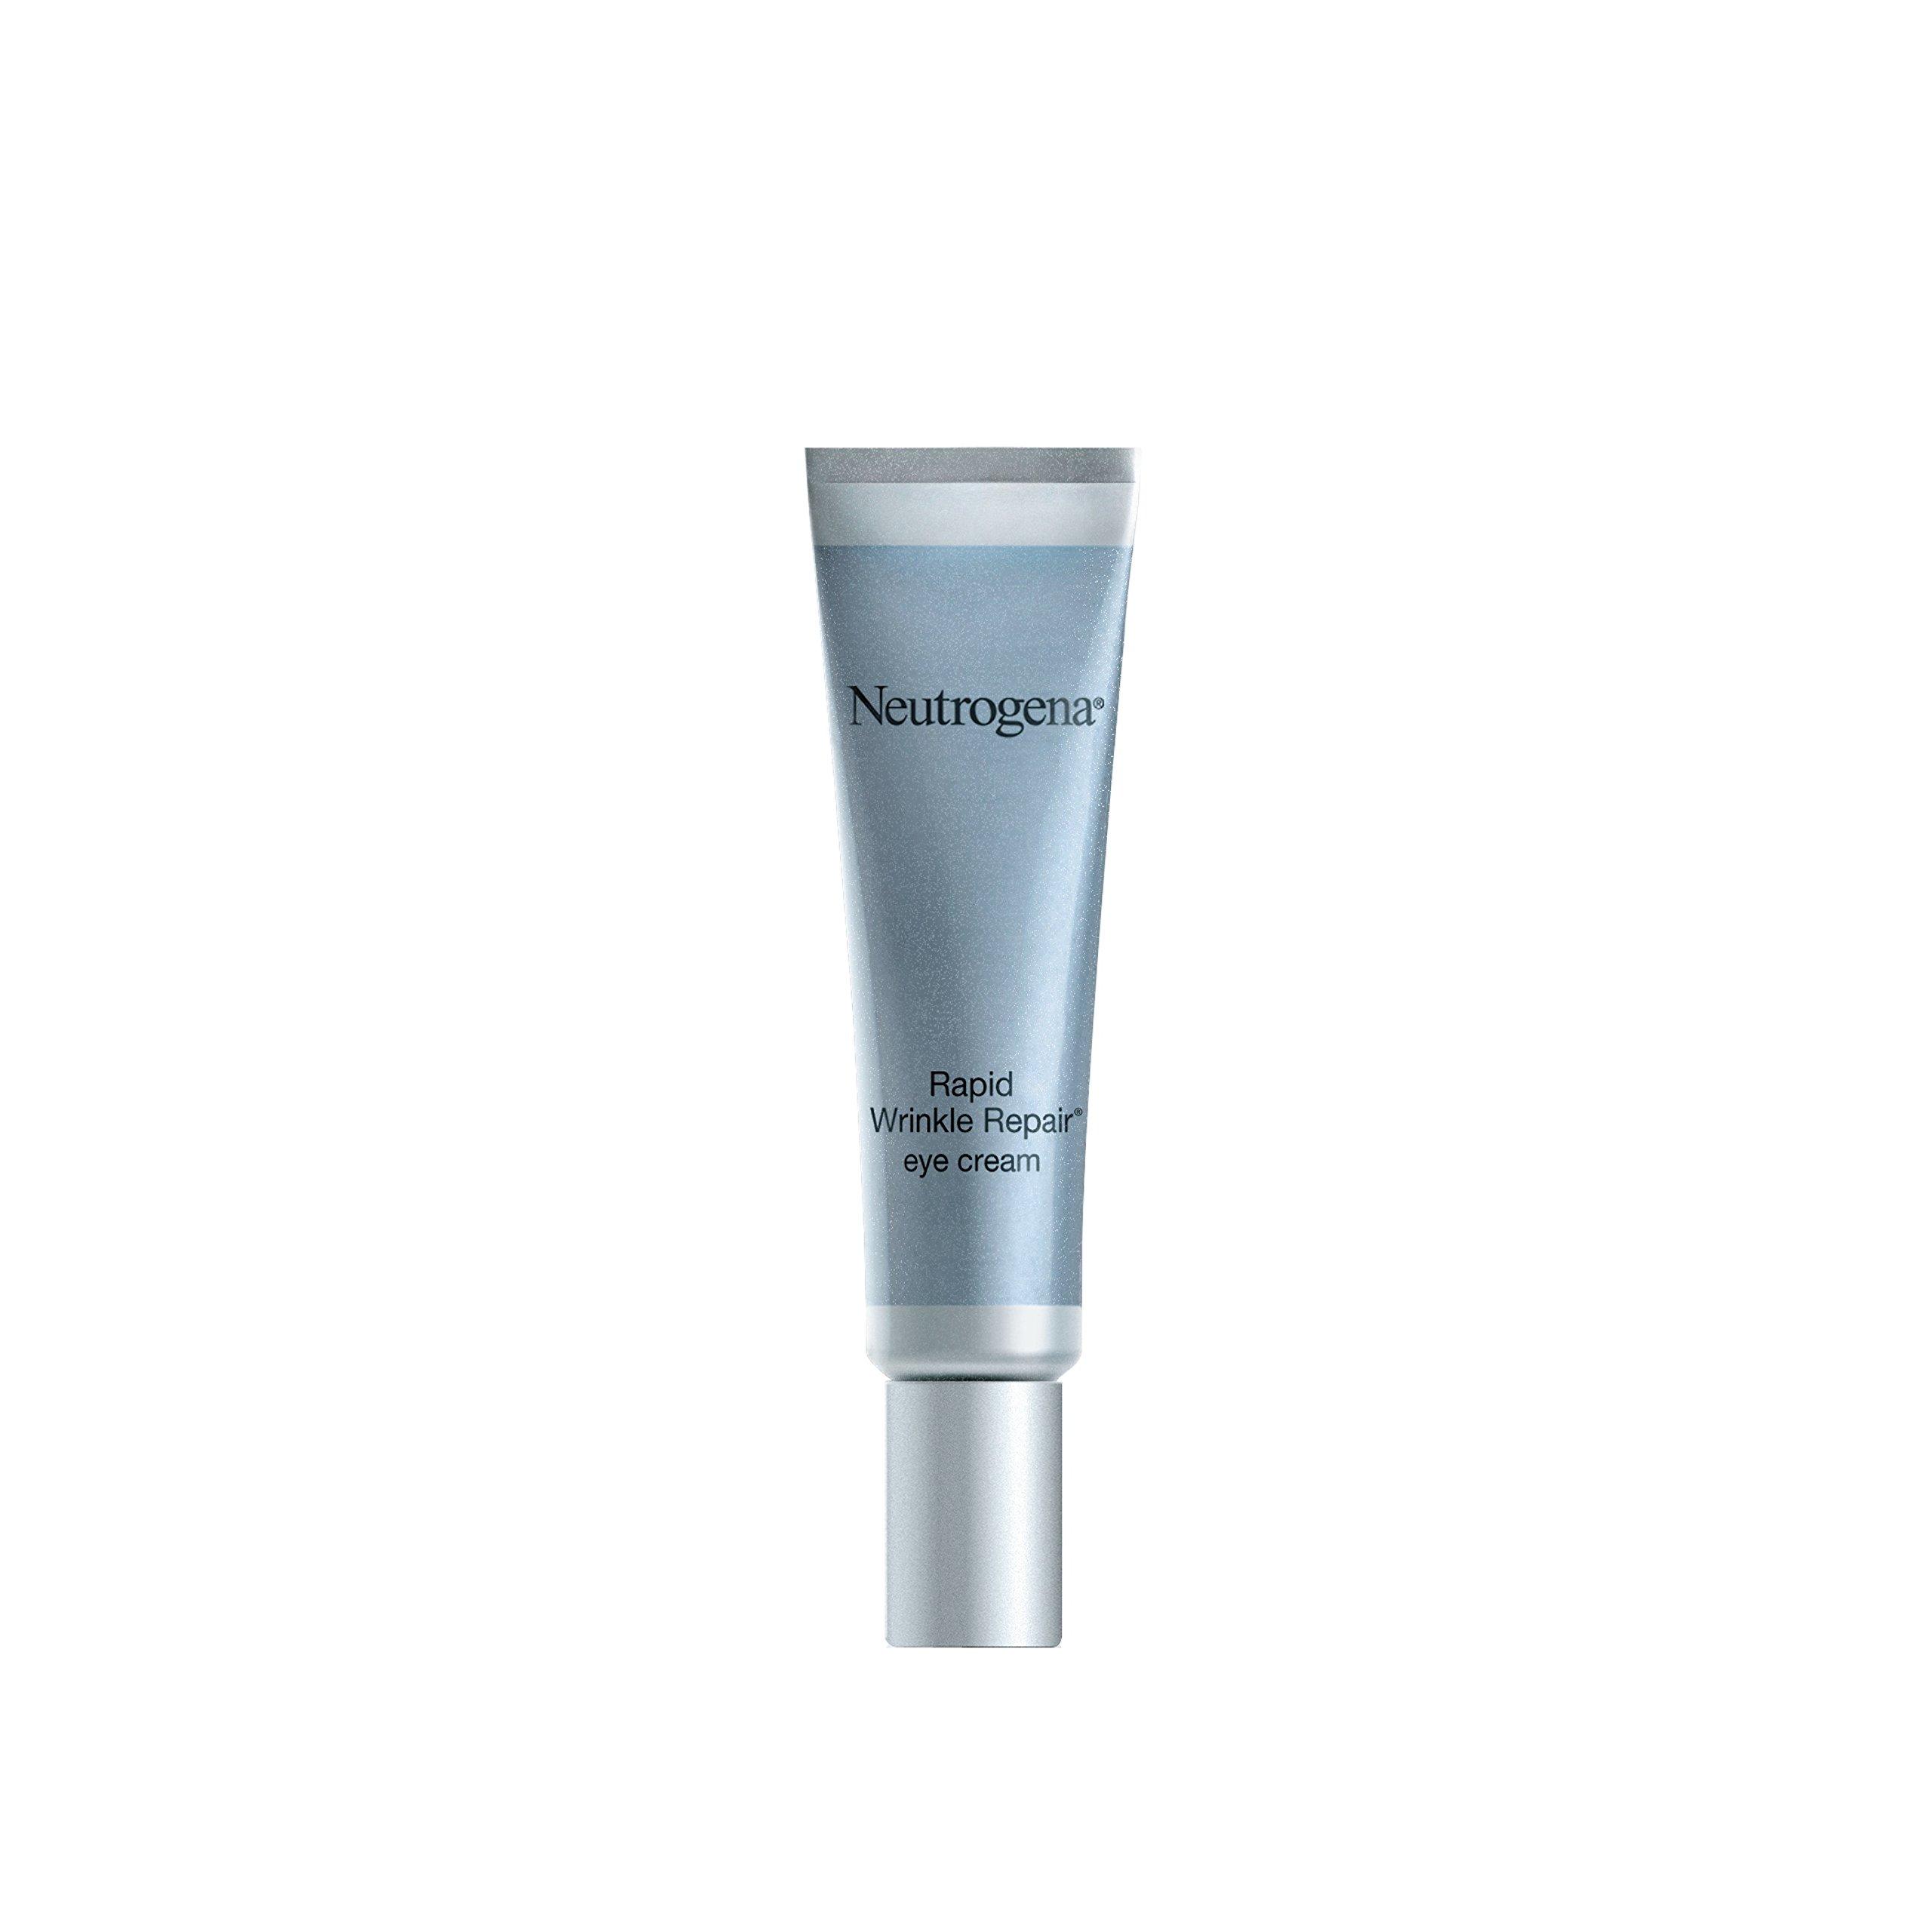 Neutrogena Rapid Wrinkle Repair Hyaluronic Acid Retinol Under Eye Cream - Anti Wrinkle Eye Cream for Dark Circles & Puffiness & Under Eye Bags - Hyaluronic Acid, Glycerin & Retinol Cream, 0.5 fl. oz by Neutrogena